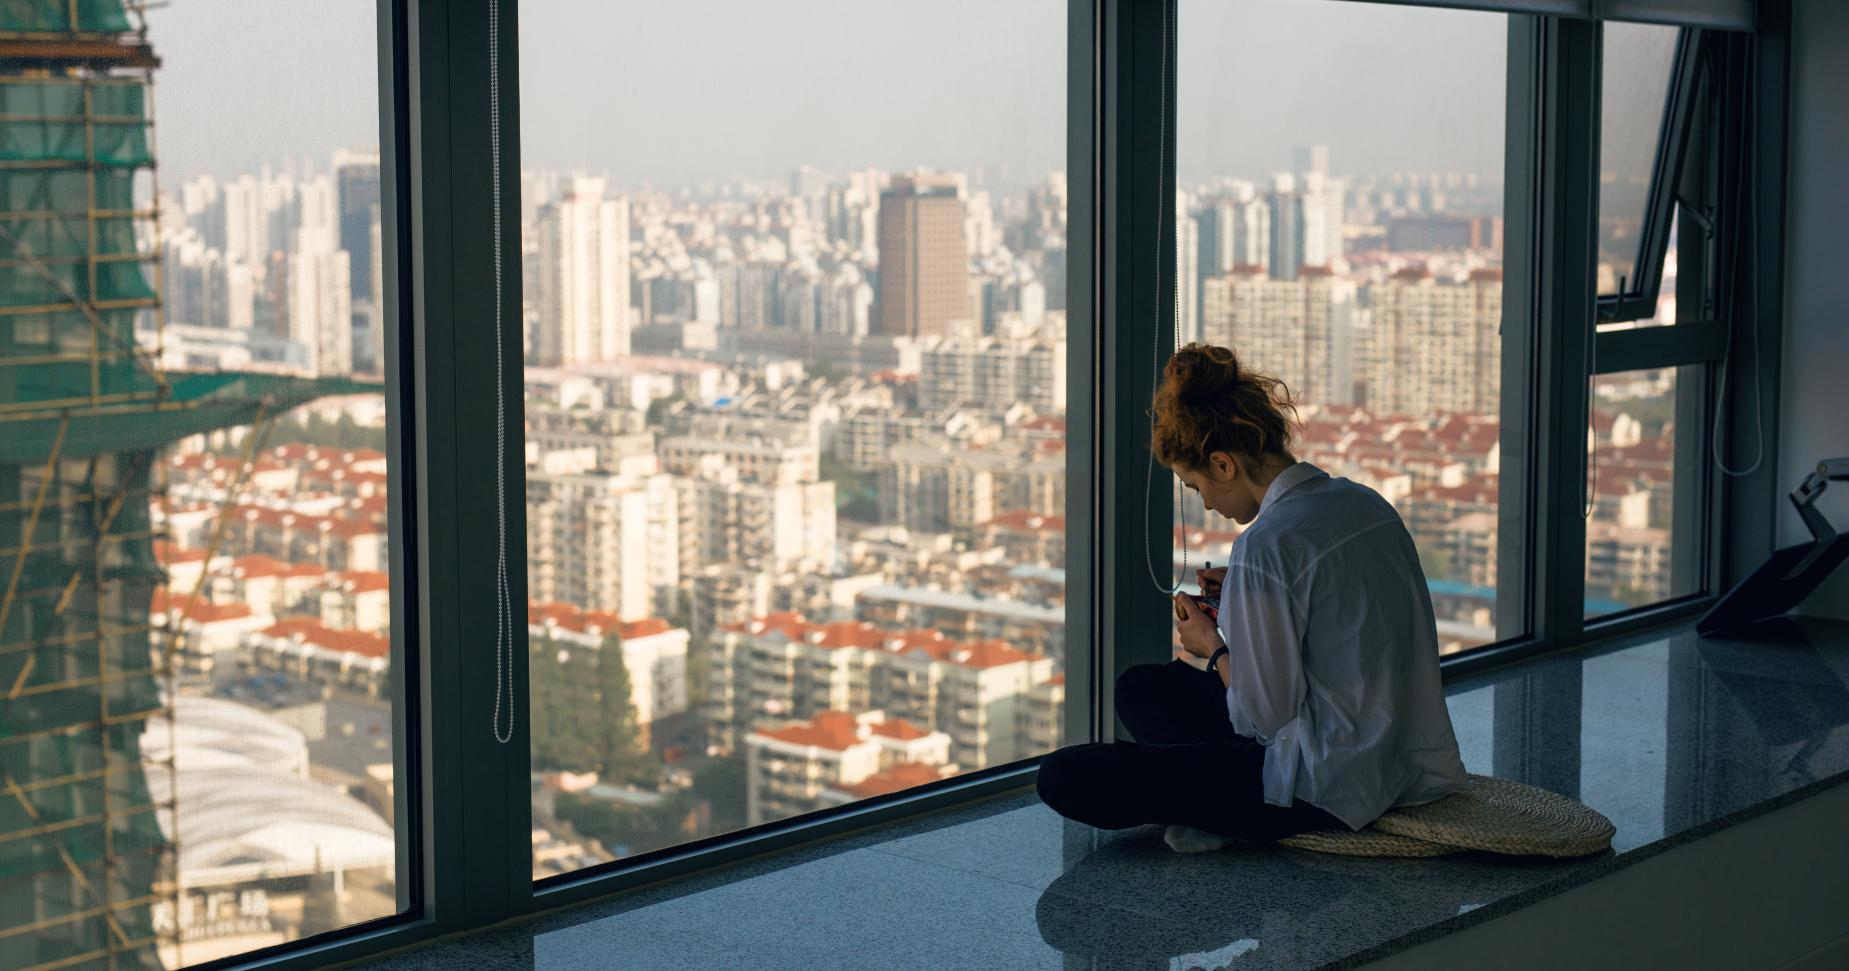 Cum traiesc izolarea sociala introvertii si extrovertii